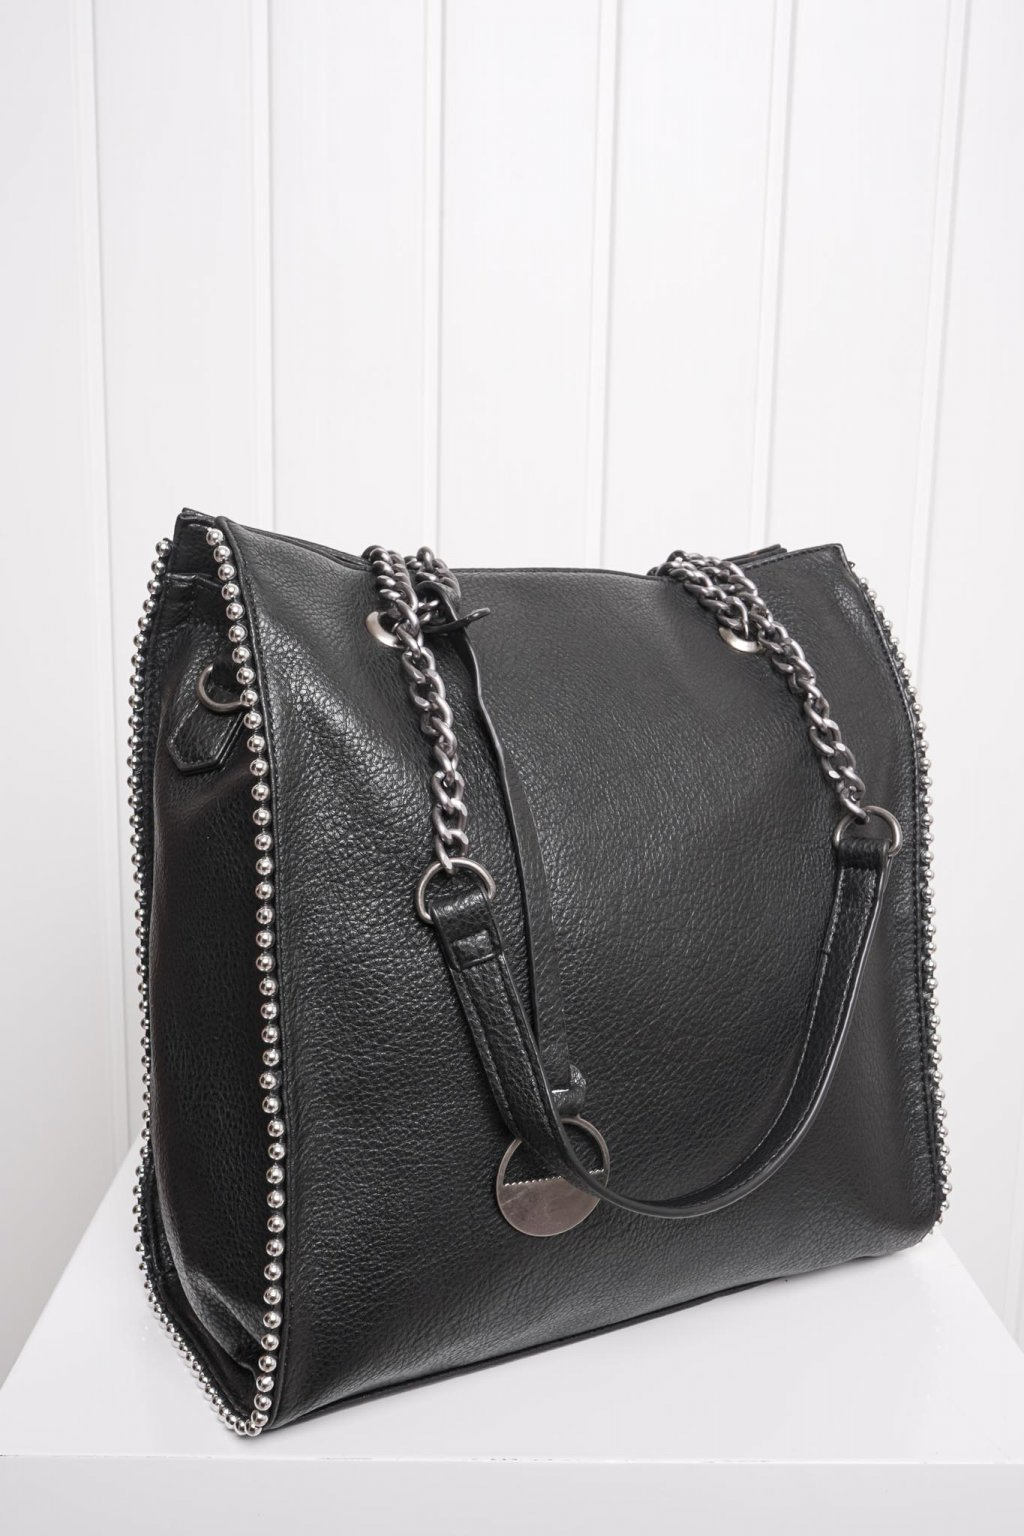 Kabelka, ruksak, dobrá cena, čierna kabelka, čierny ruksak, basic, kabelky, ruksaky 060